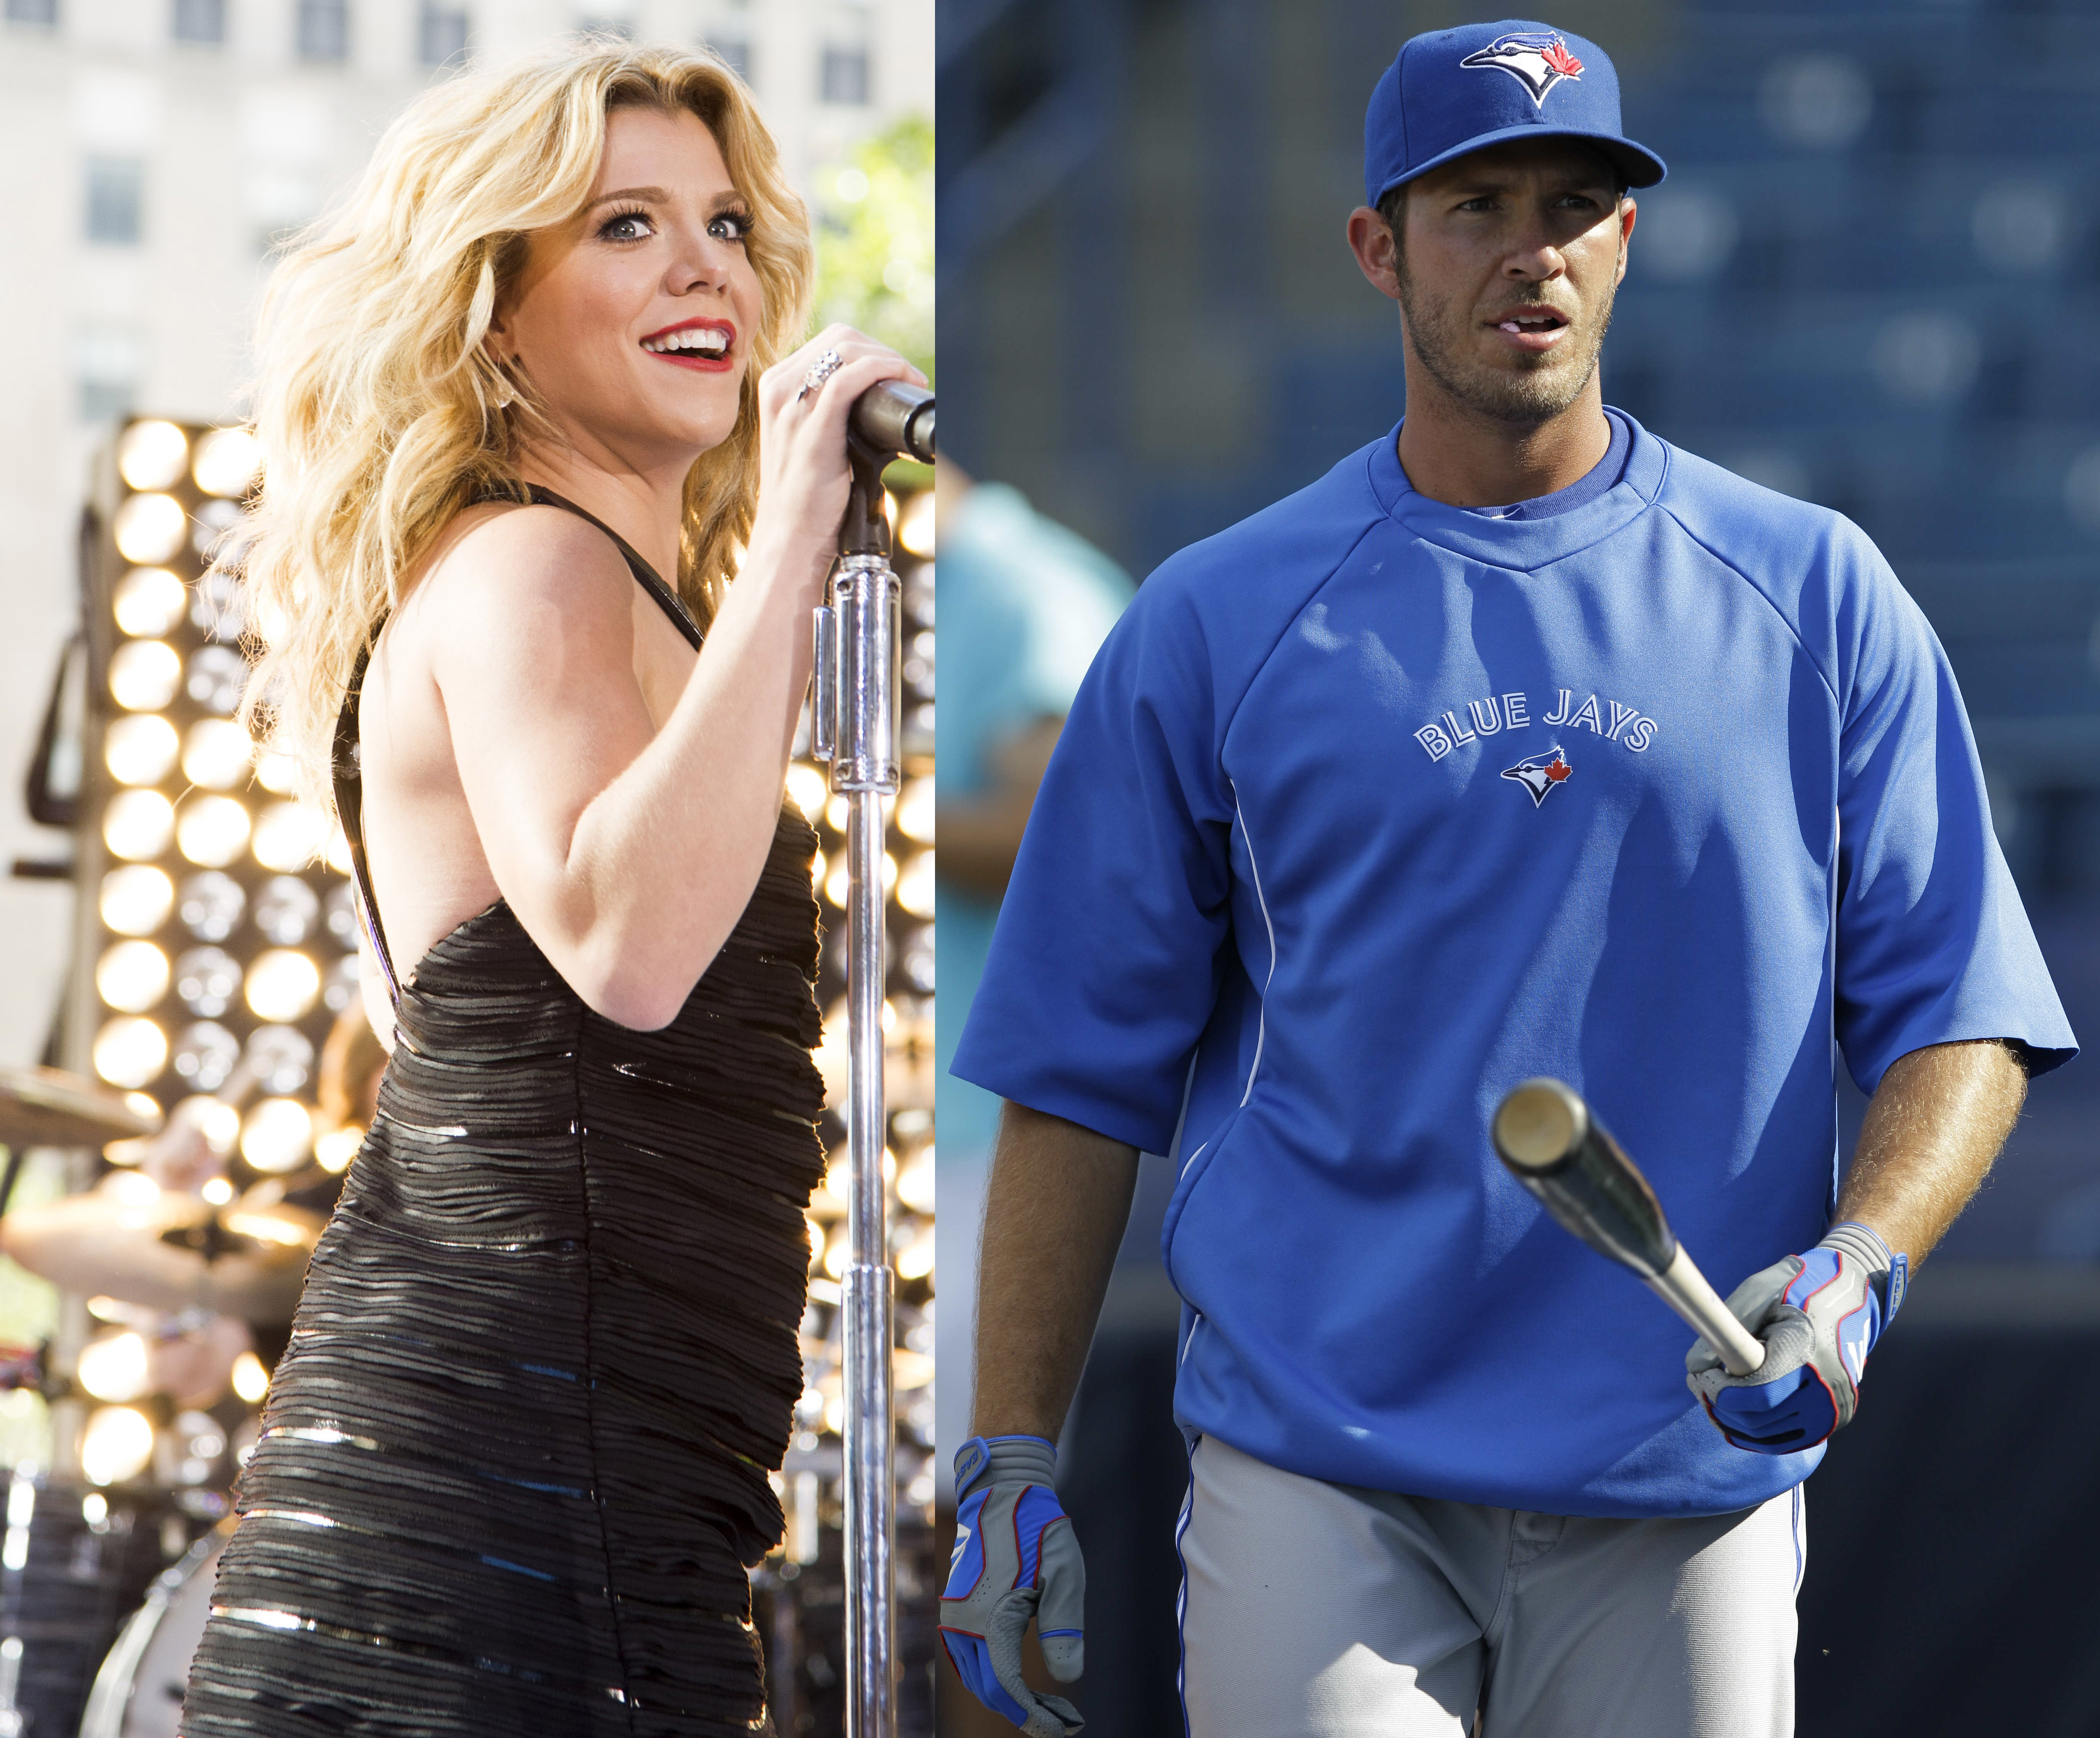 Kimberly Perry engaged baseball player